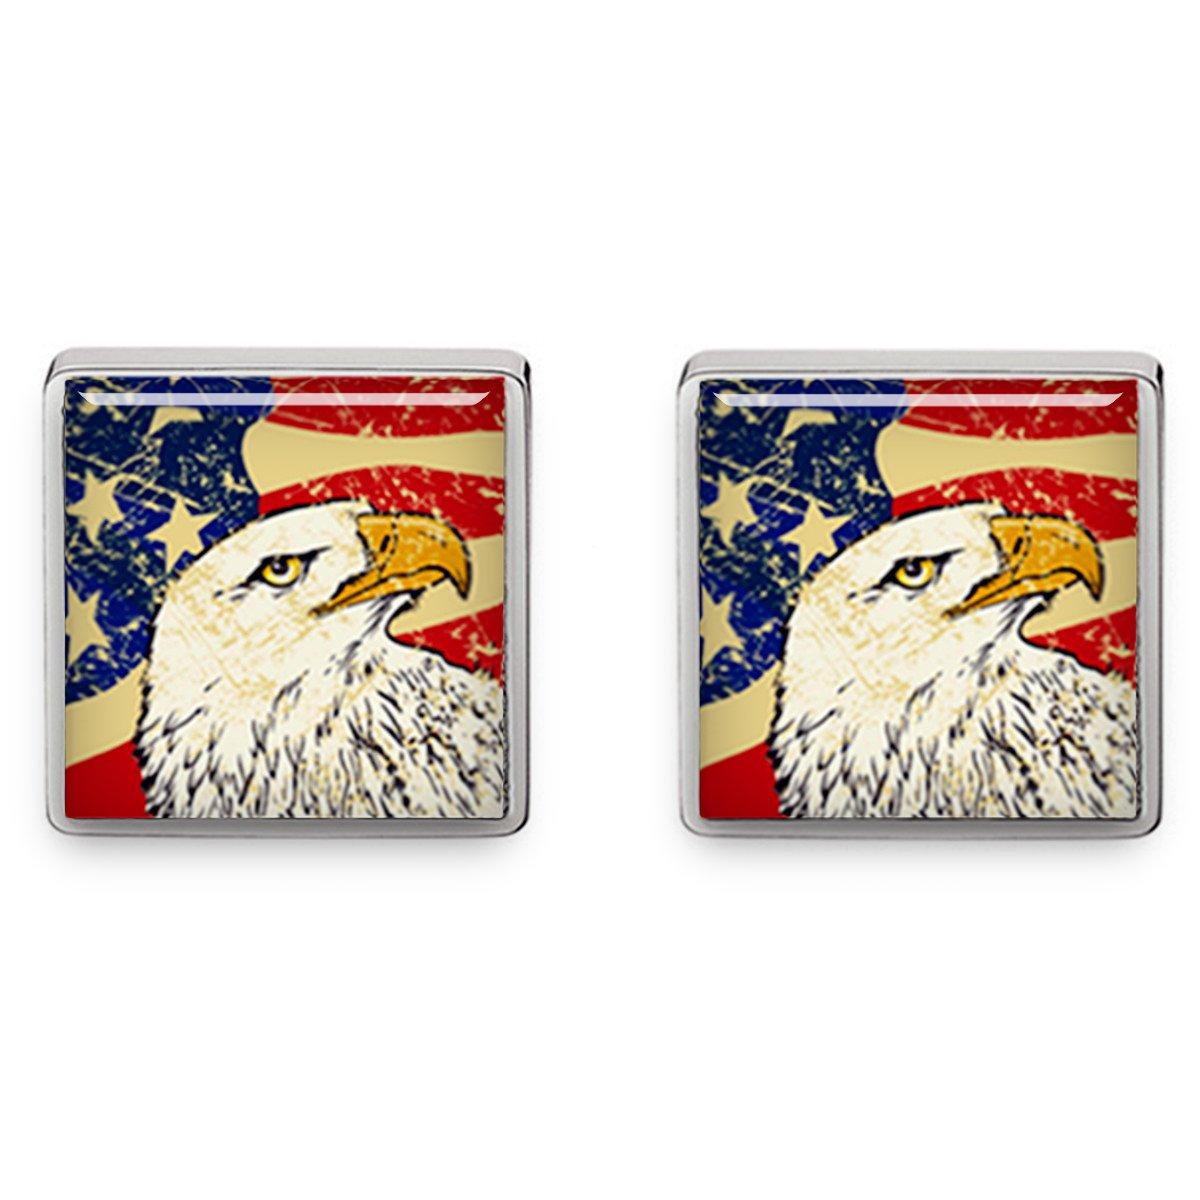 Kooer Square Bald Eagle Cufflinks American Flag Square Cuff Links Handmade Custom Personalized Wedding Jewelry (Square silver plated cufflinks)